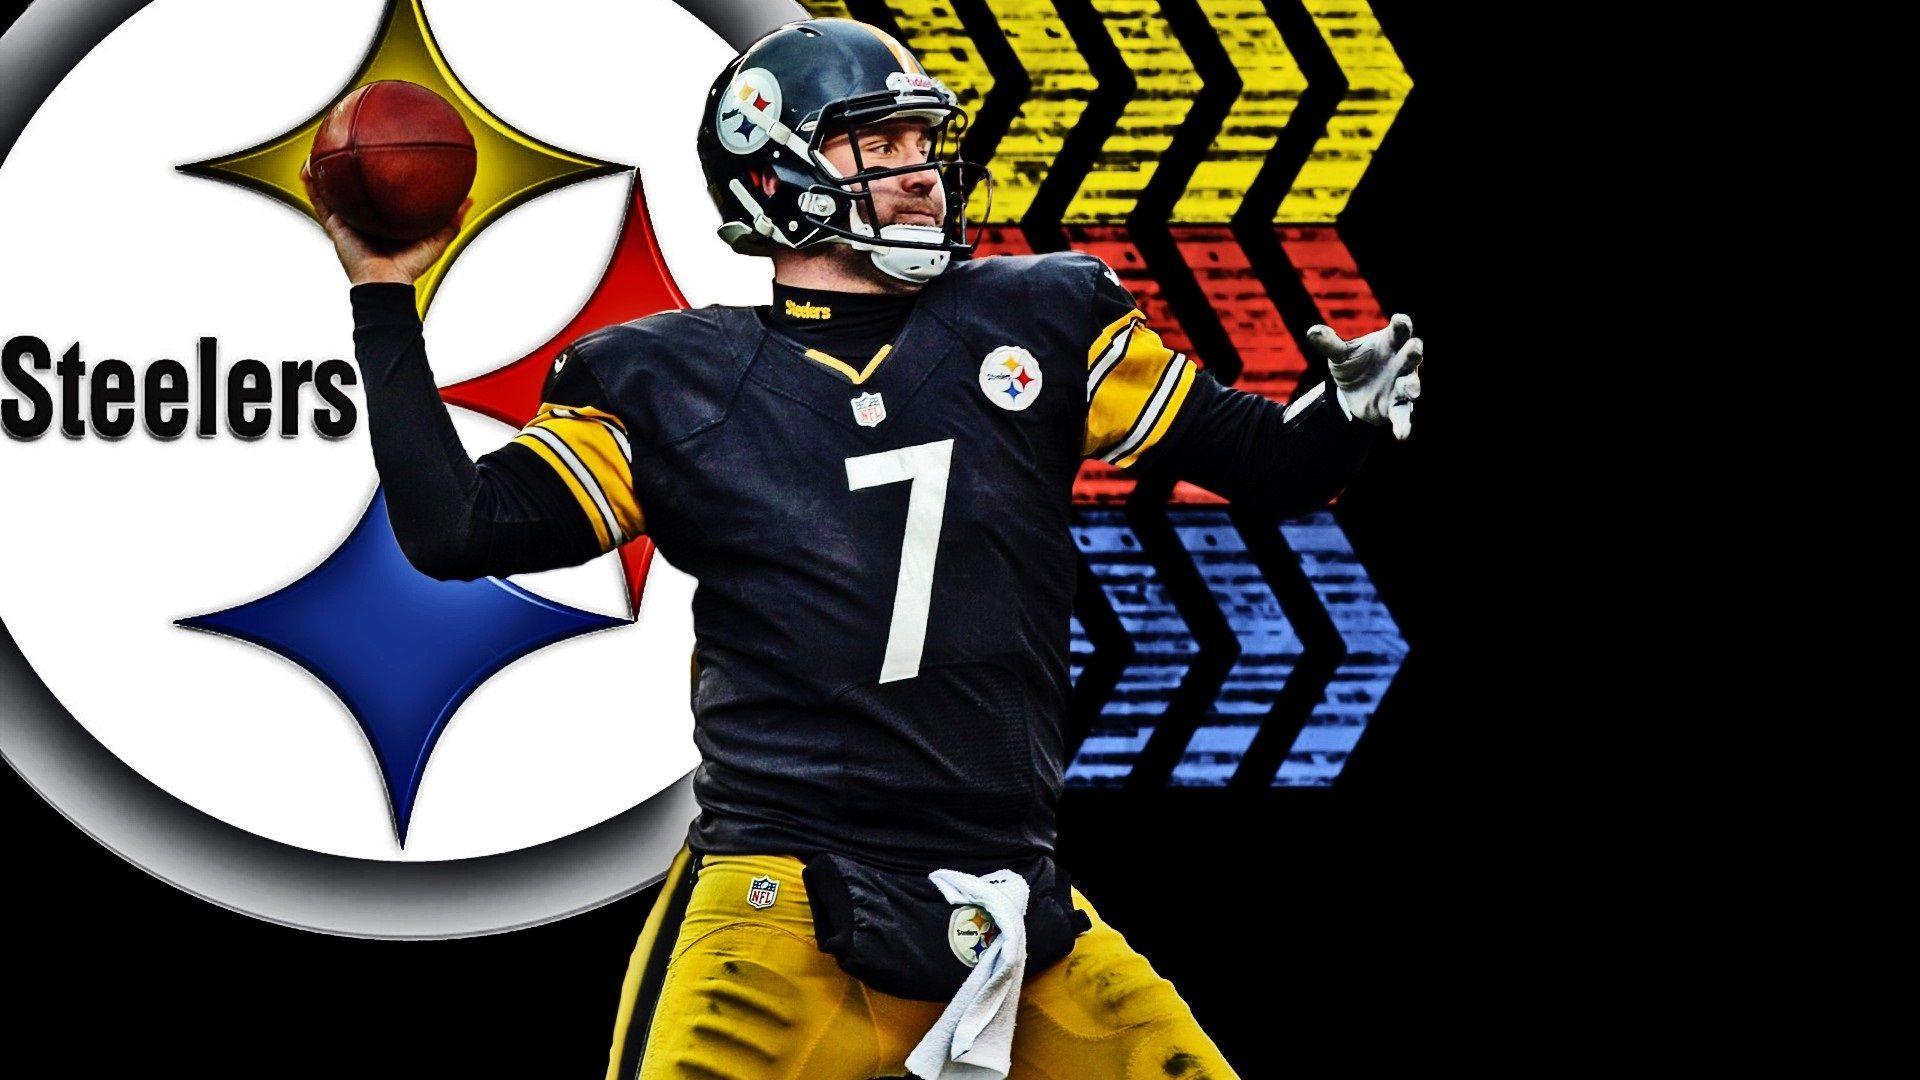 Nfl Steelers Mac Backgrounds Mac Backgrounds Nfl Steelers Nfl